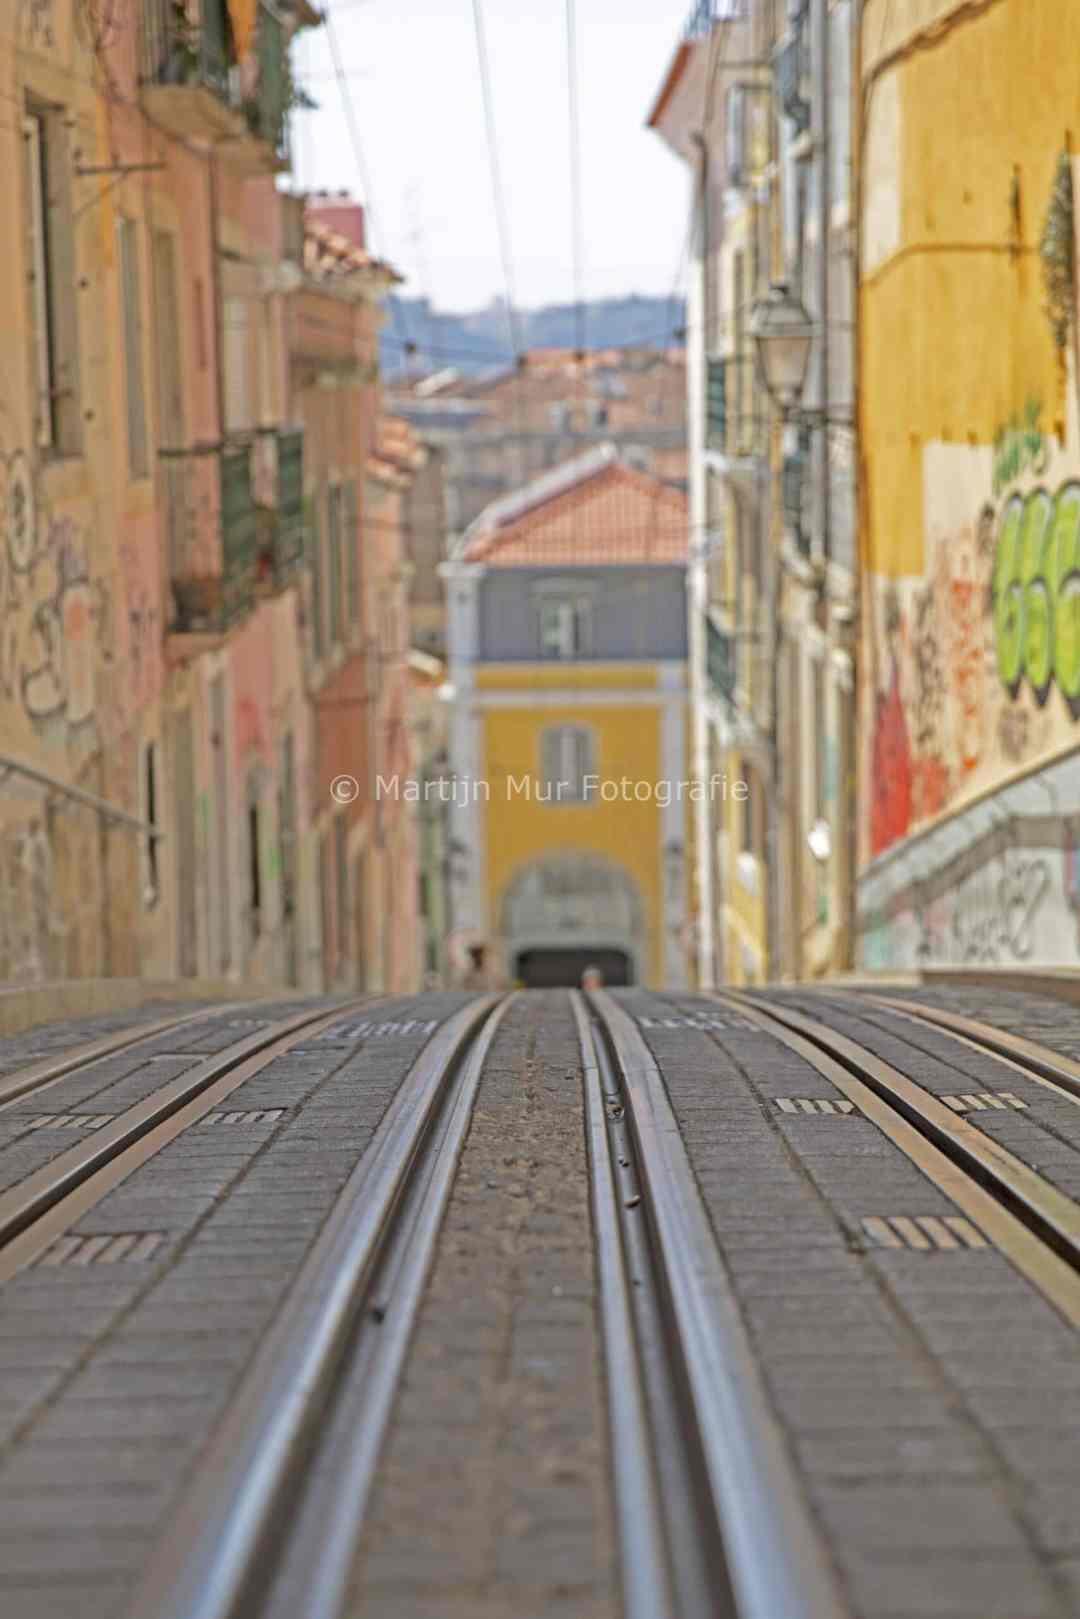 tramrails met gekleurde huizen in Lissabon, reisfotografie